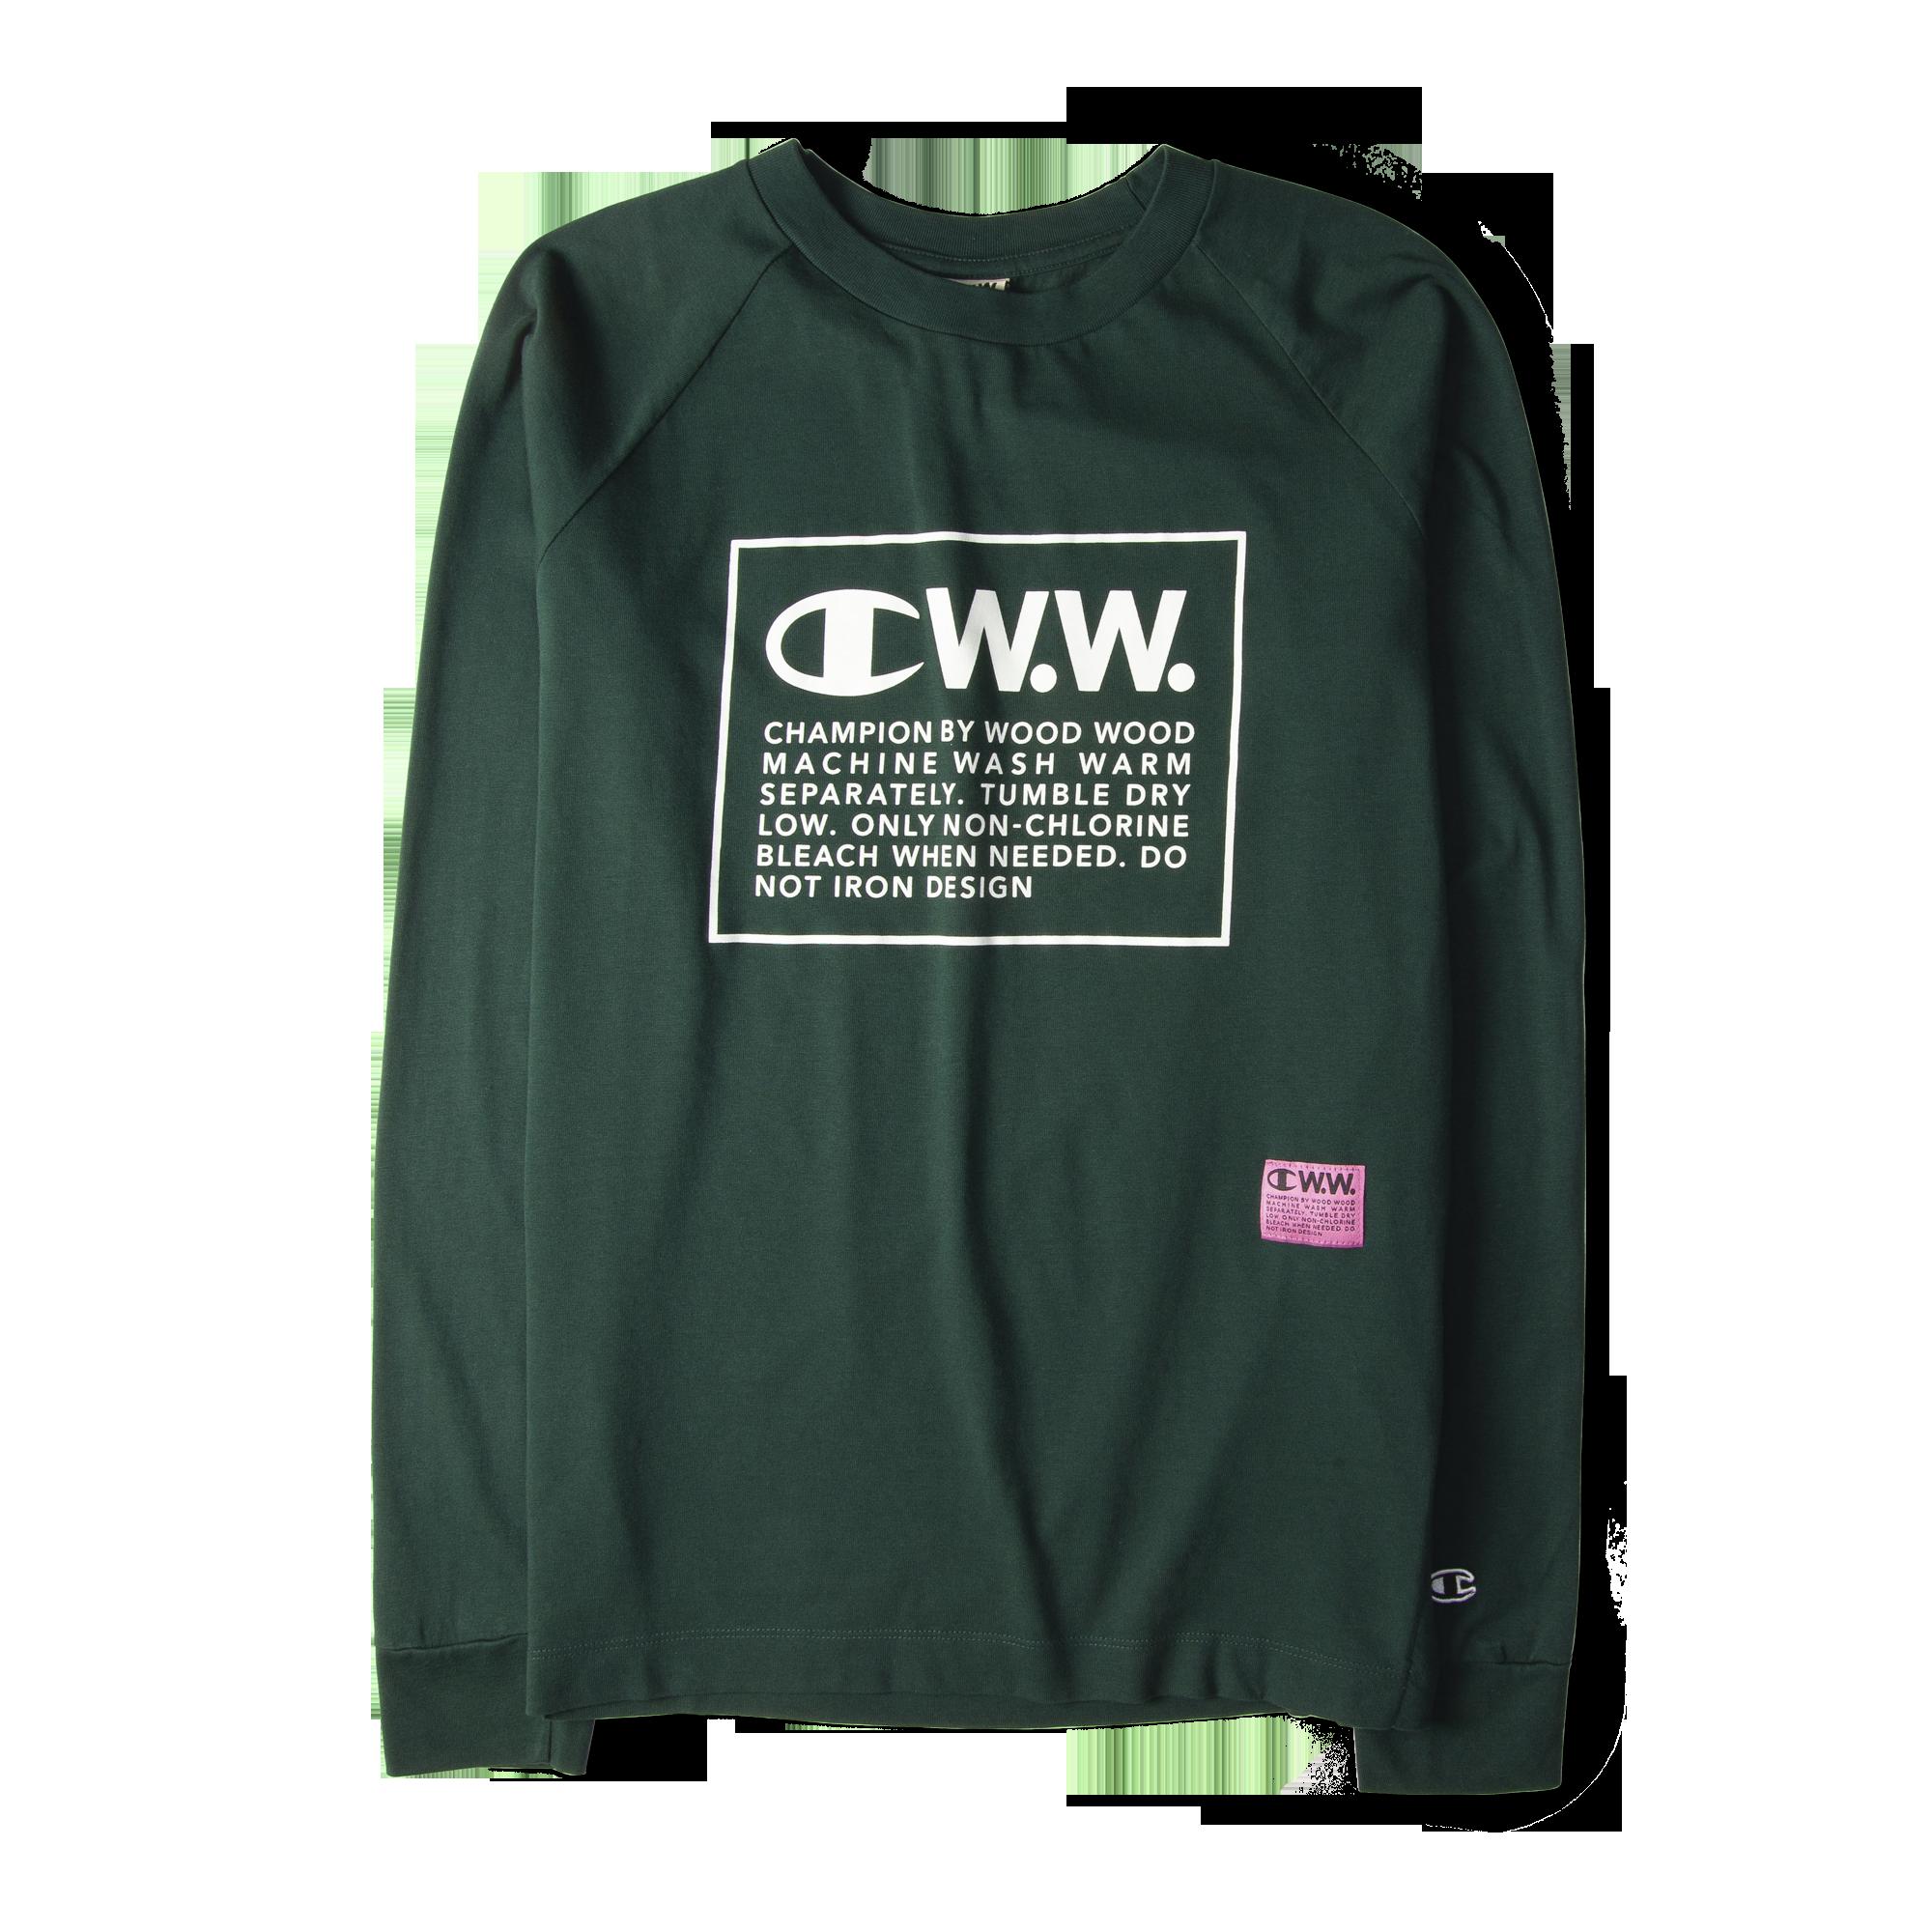 0157bacca139 Champion X Wood Wood Long Sleeve Box Logo Tee Green Free SHIPPING OVER  £50.00 #grants #1856 #grants1856